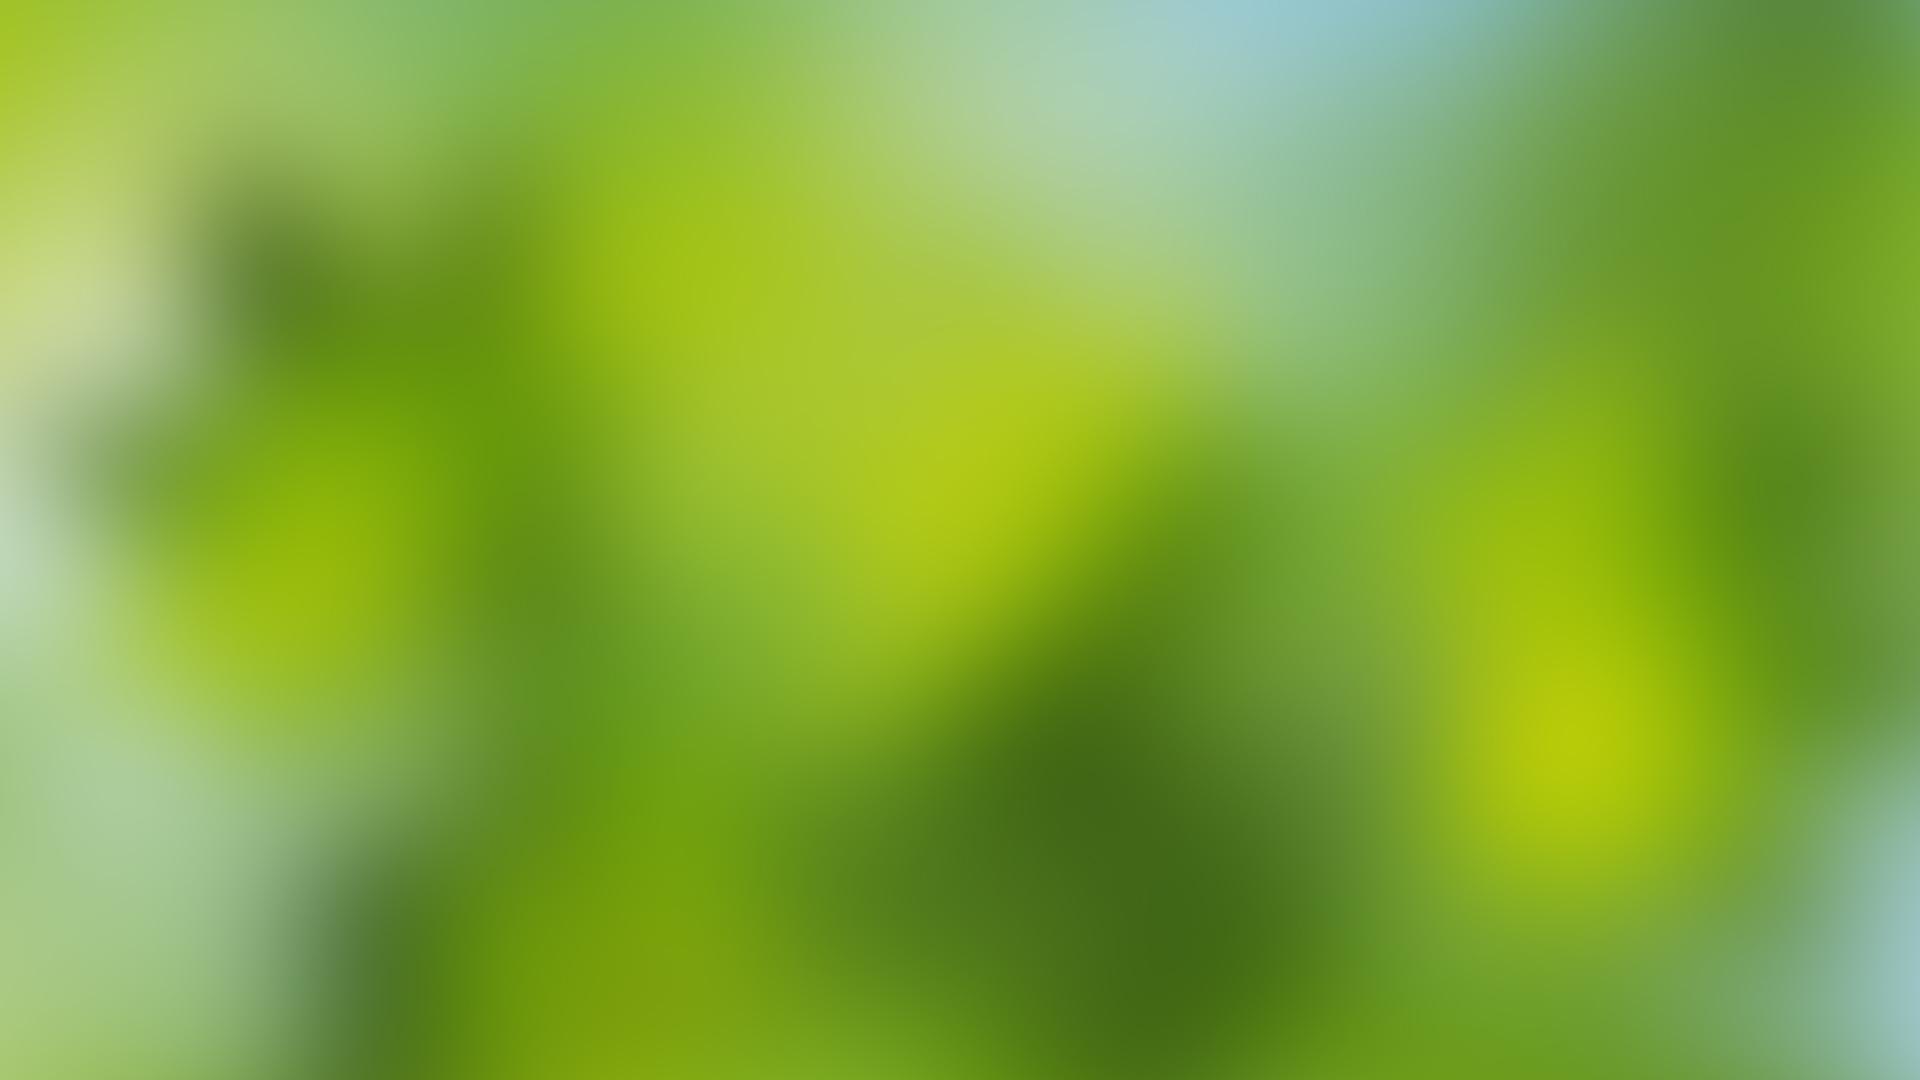 Blurred_Background_20